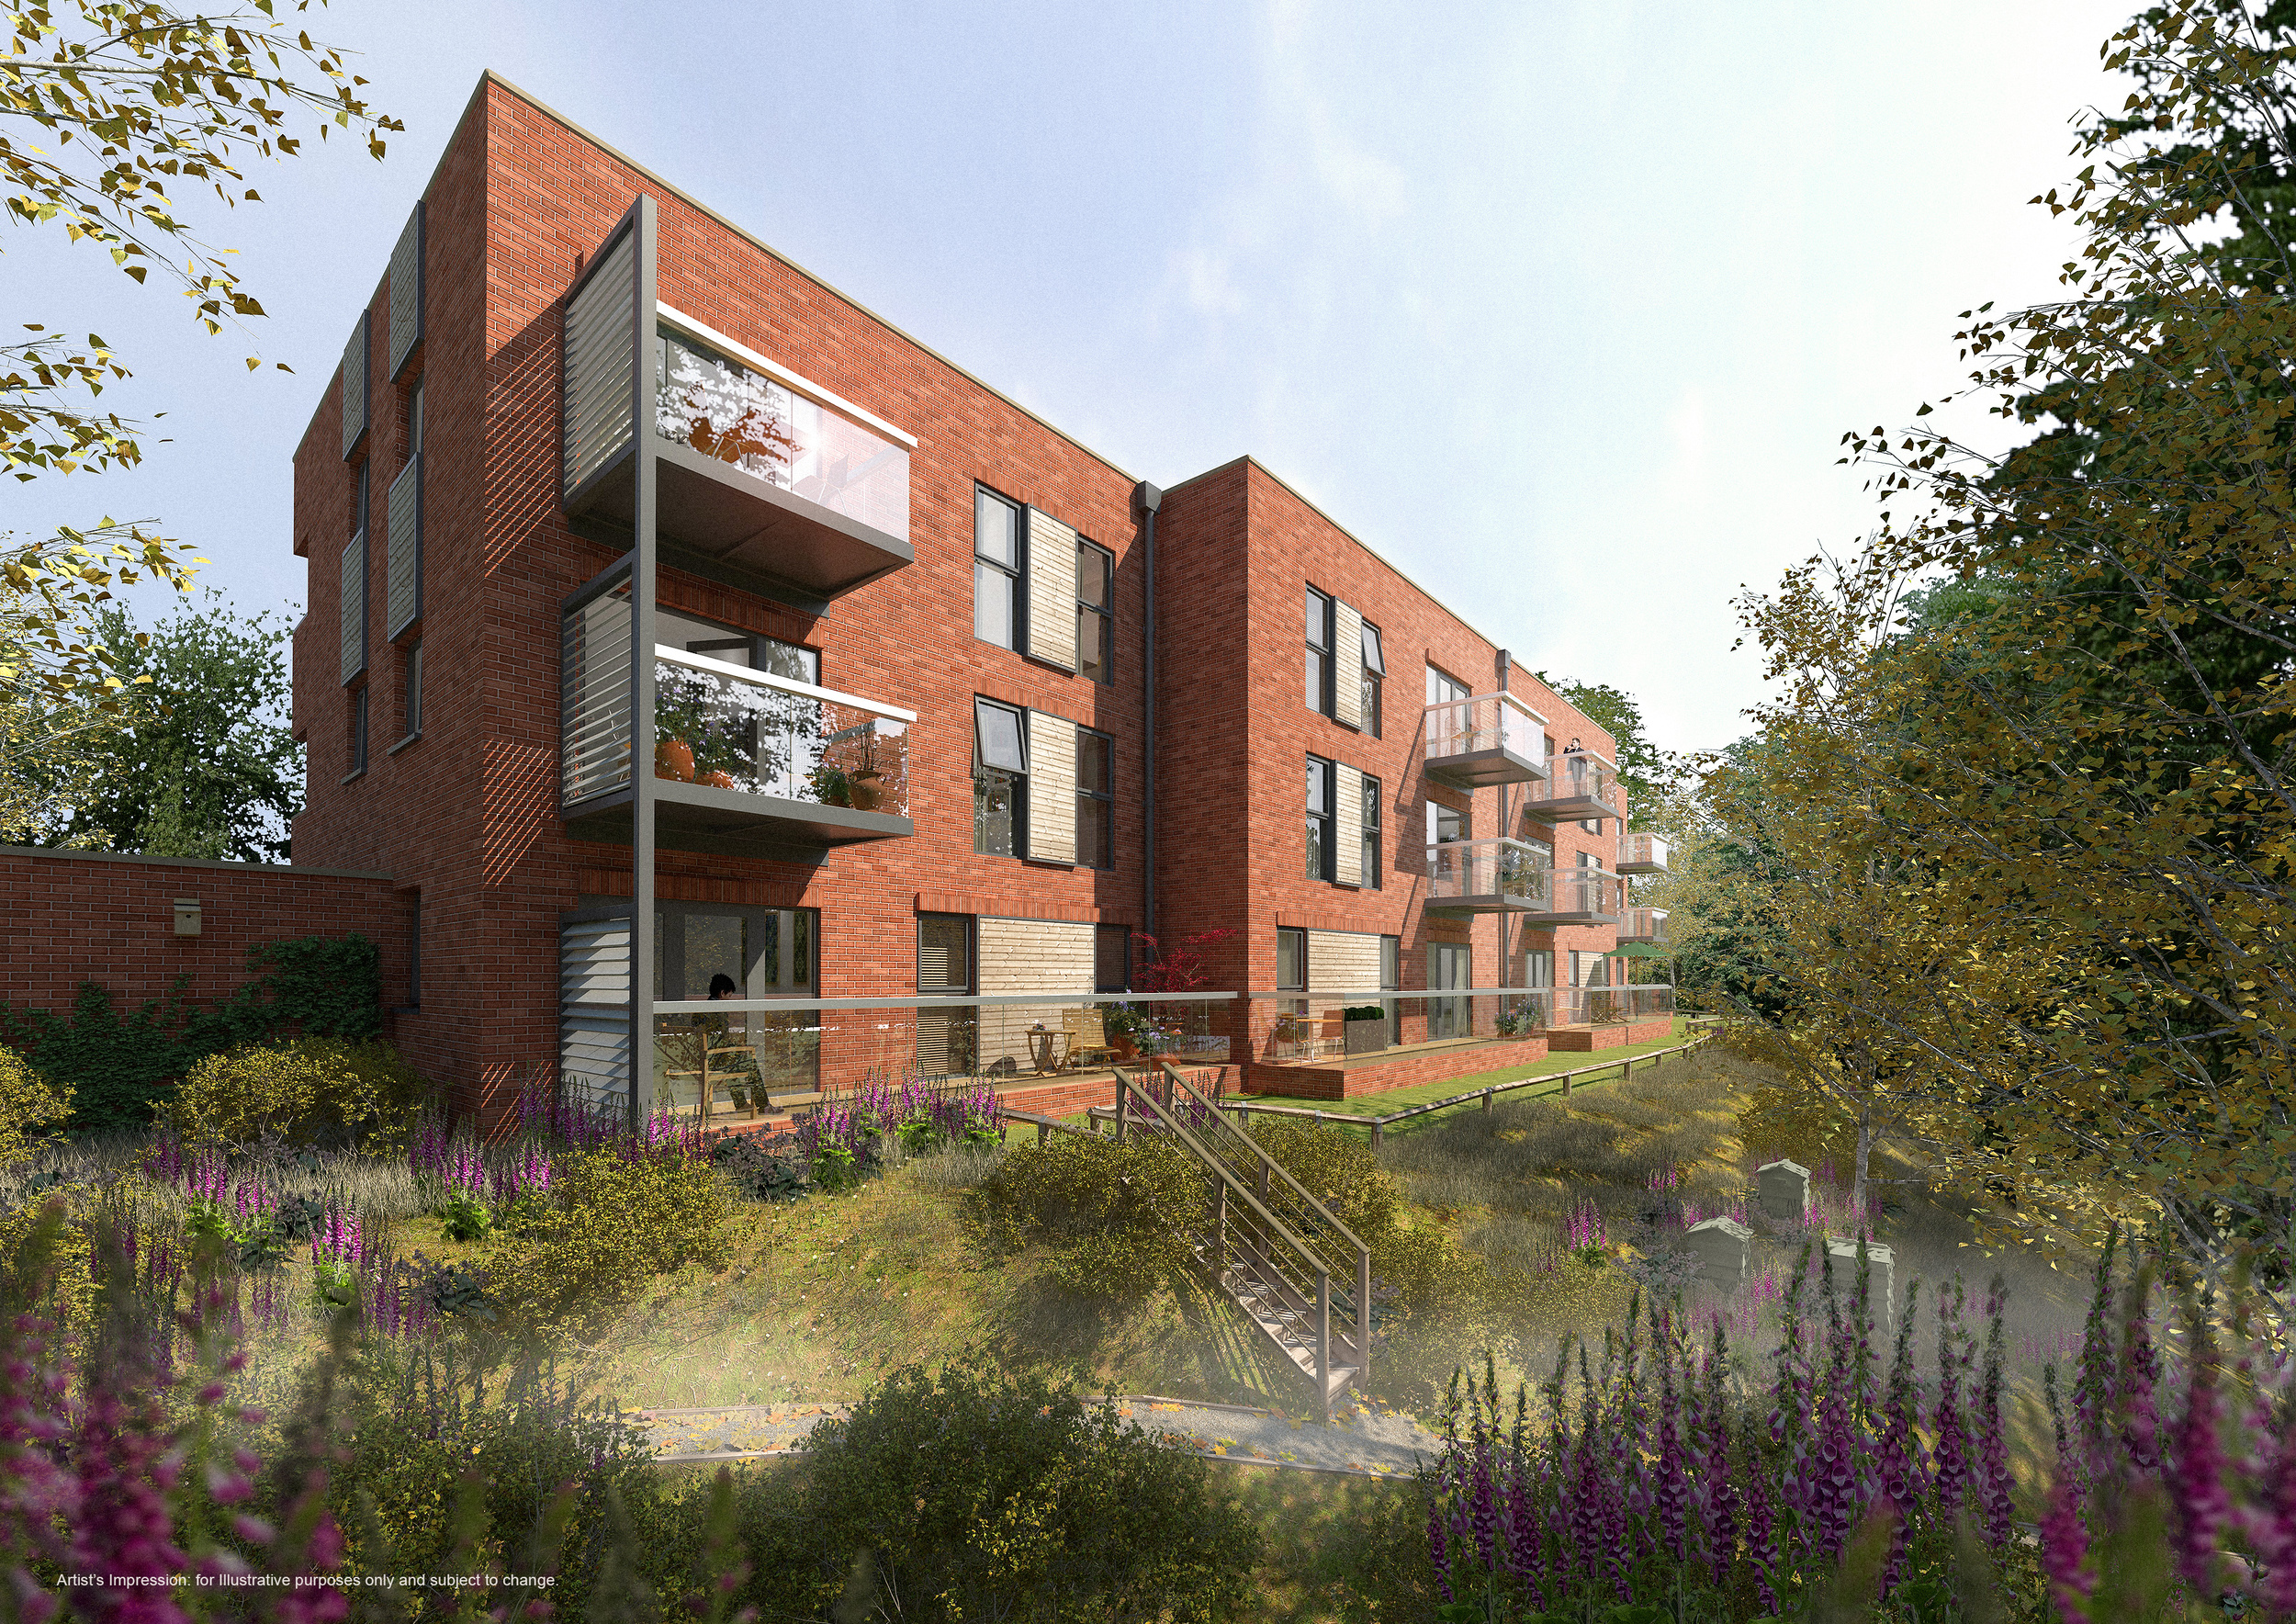 Apartments: Twentywell Lane, Sheffield: (Built)